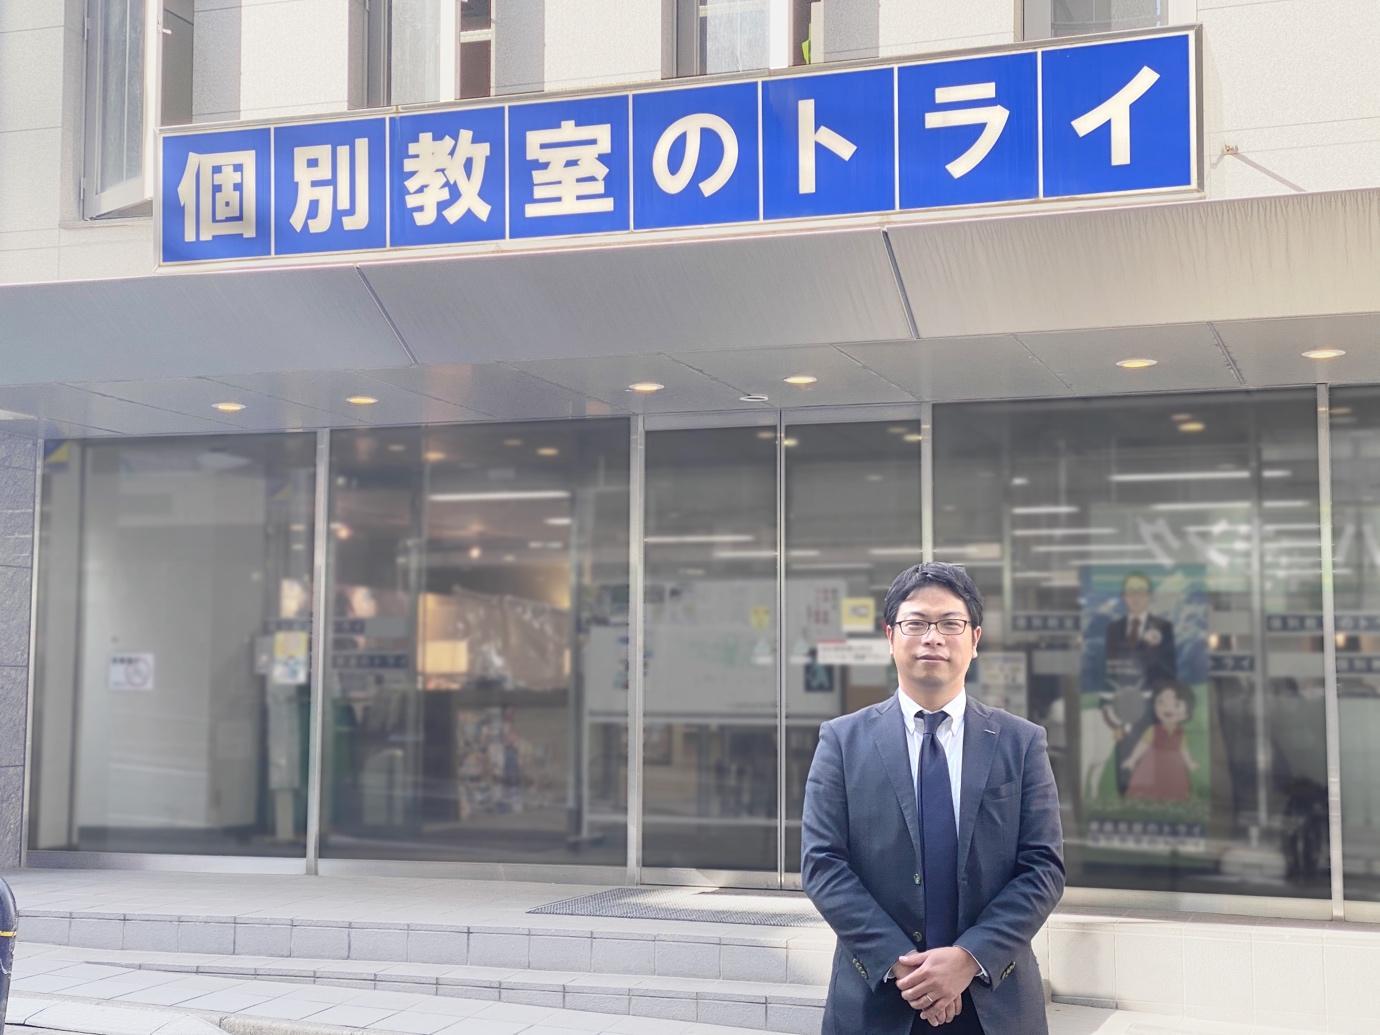 株式会社トライグループ 総務部 部長 釜瀬 幸一郎 様